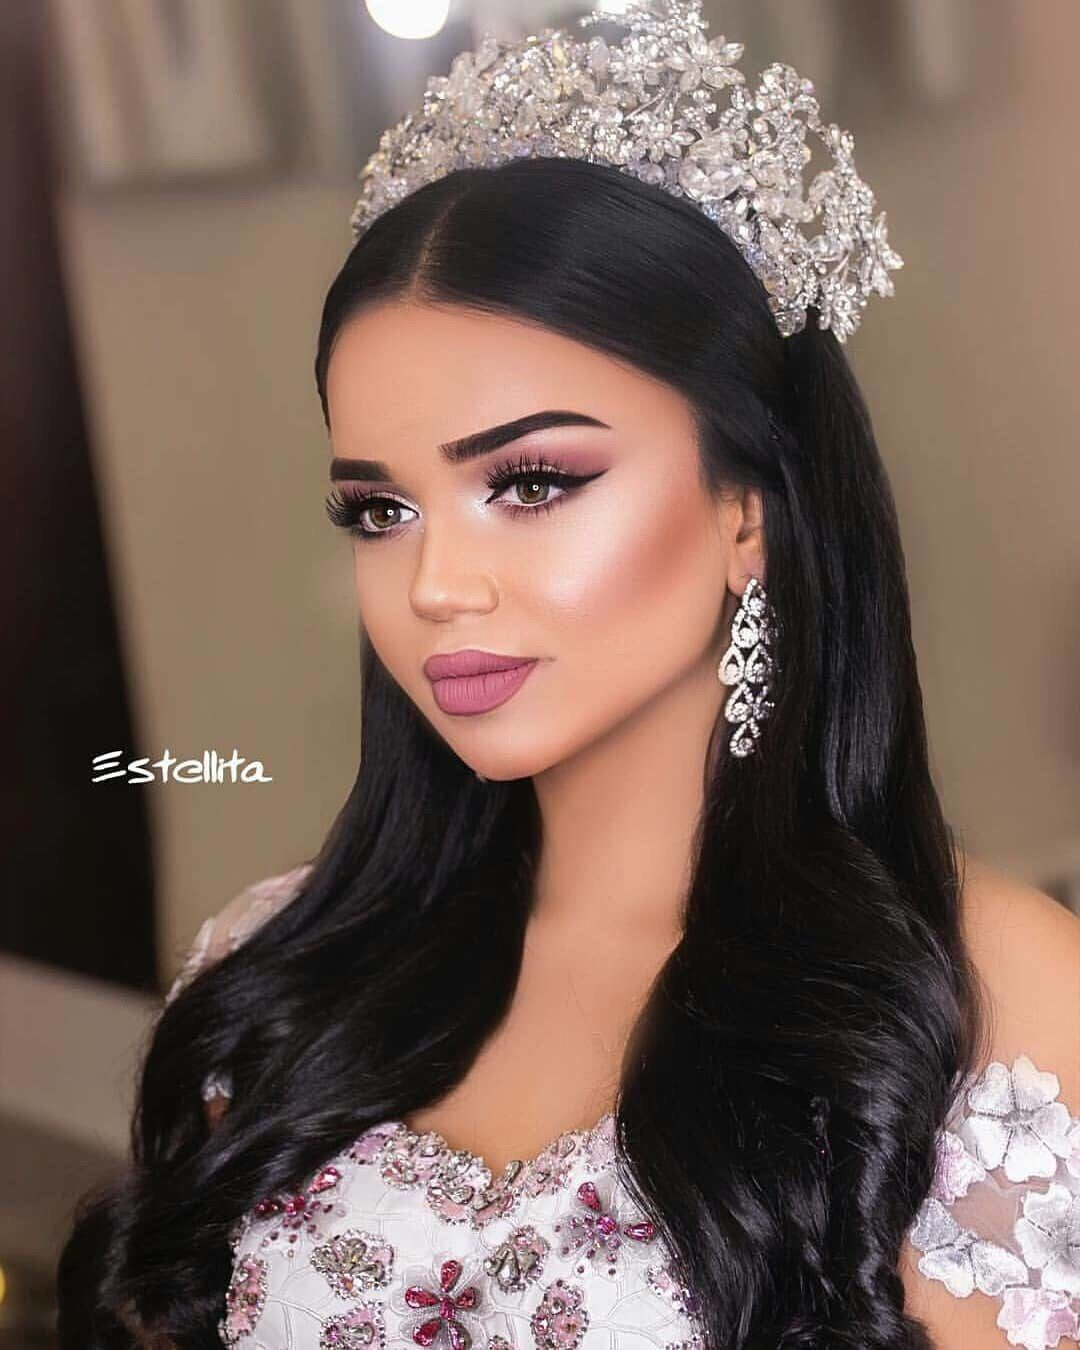 Pin By Filiz Canli On Gelinlik Bride Makeup Wedding Hair And Makeup Fresh Wedding Makeup